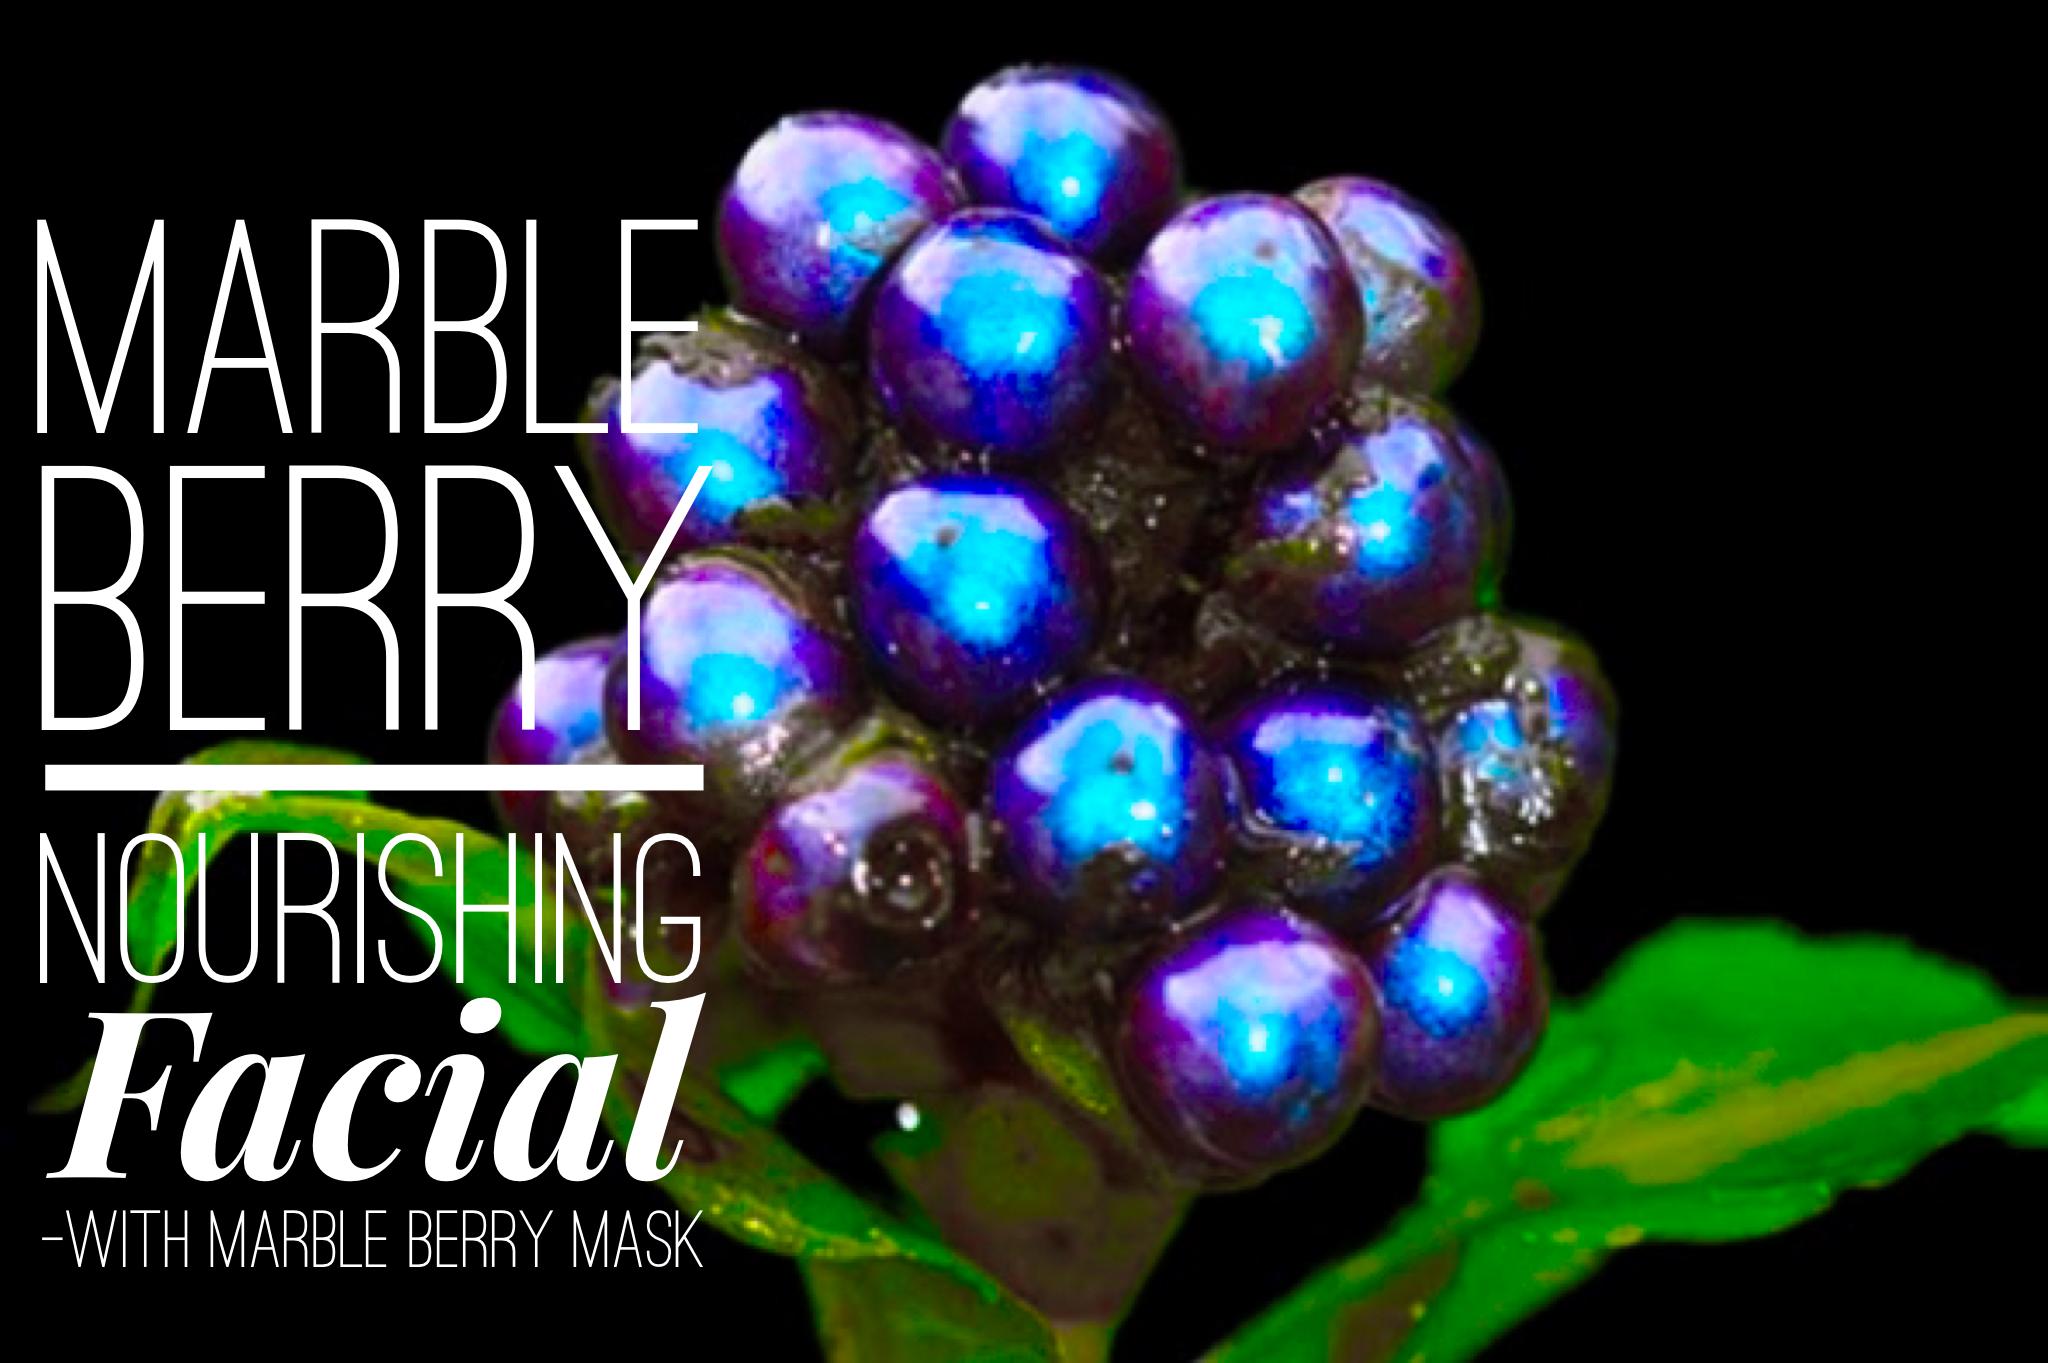 Marble Berry Nourishing Facial